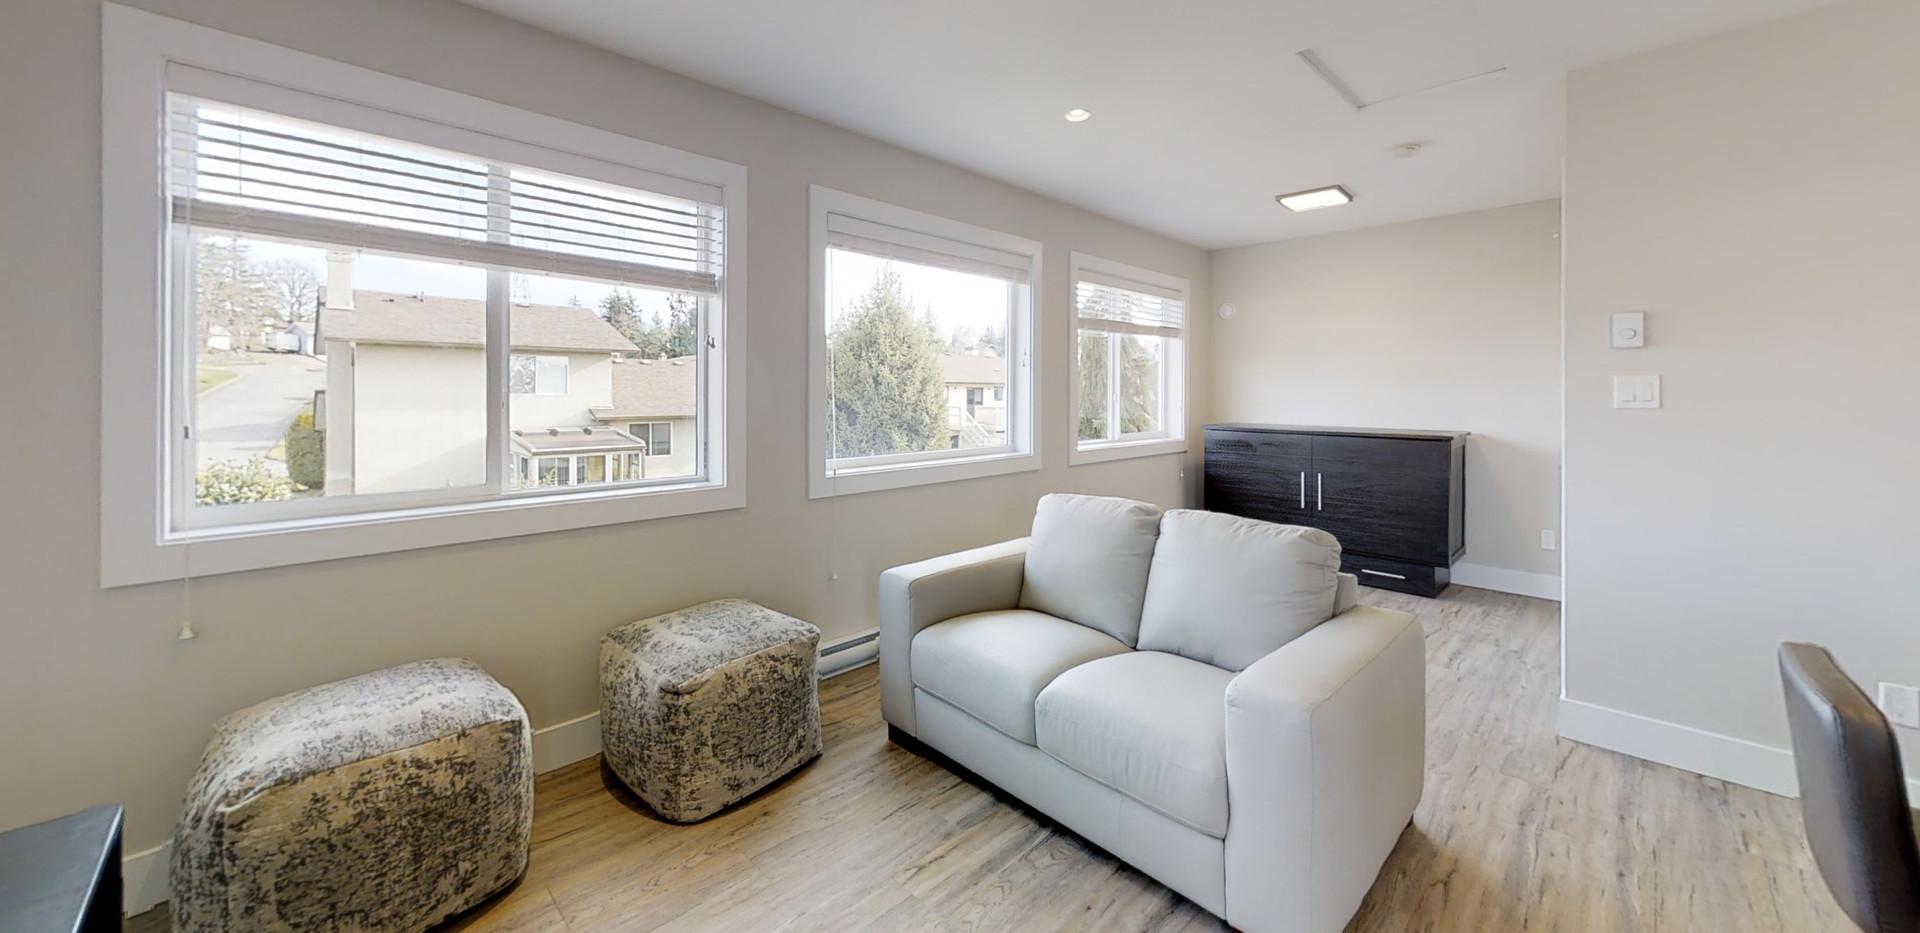 4251-Pullet-Pl-Living-Room.jpg